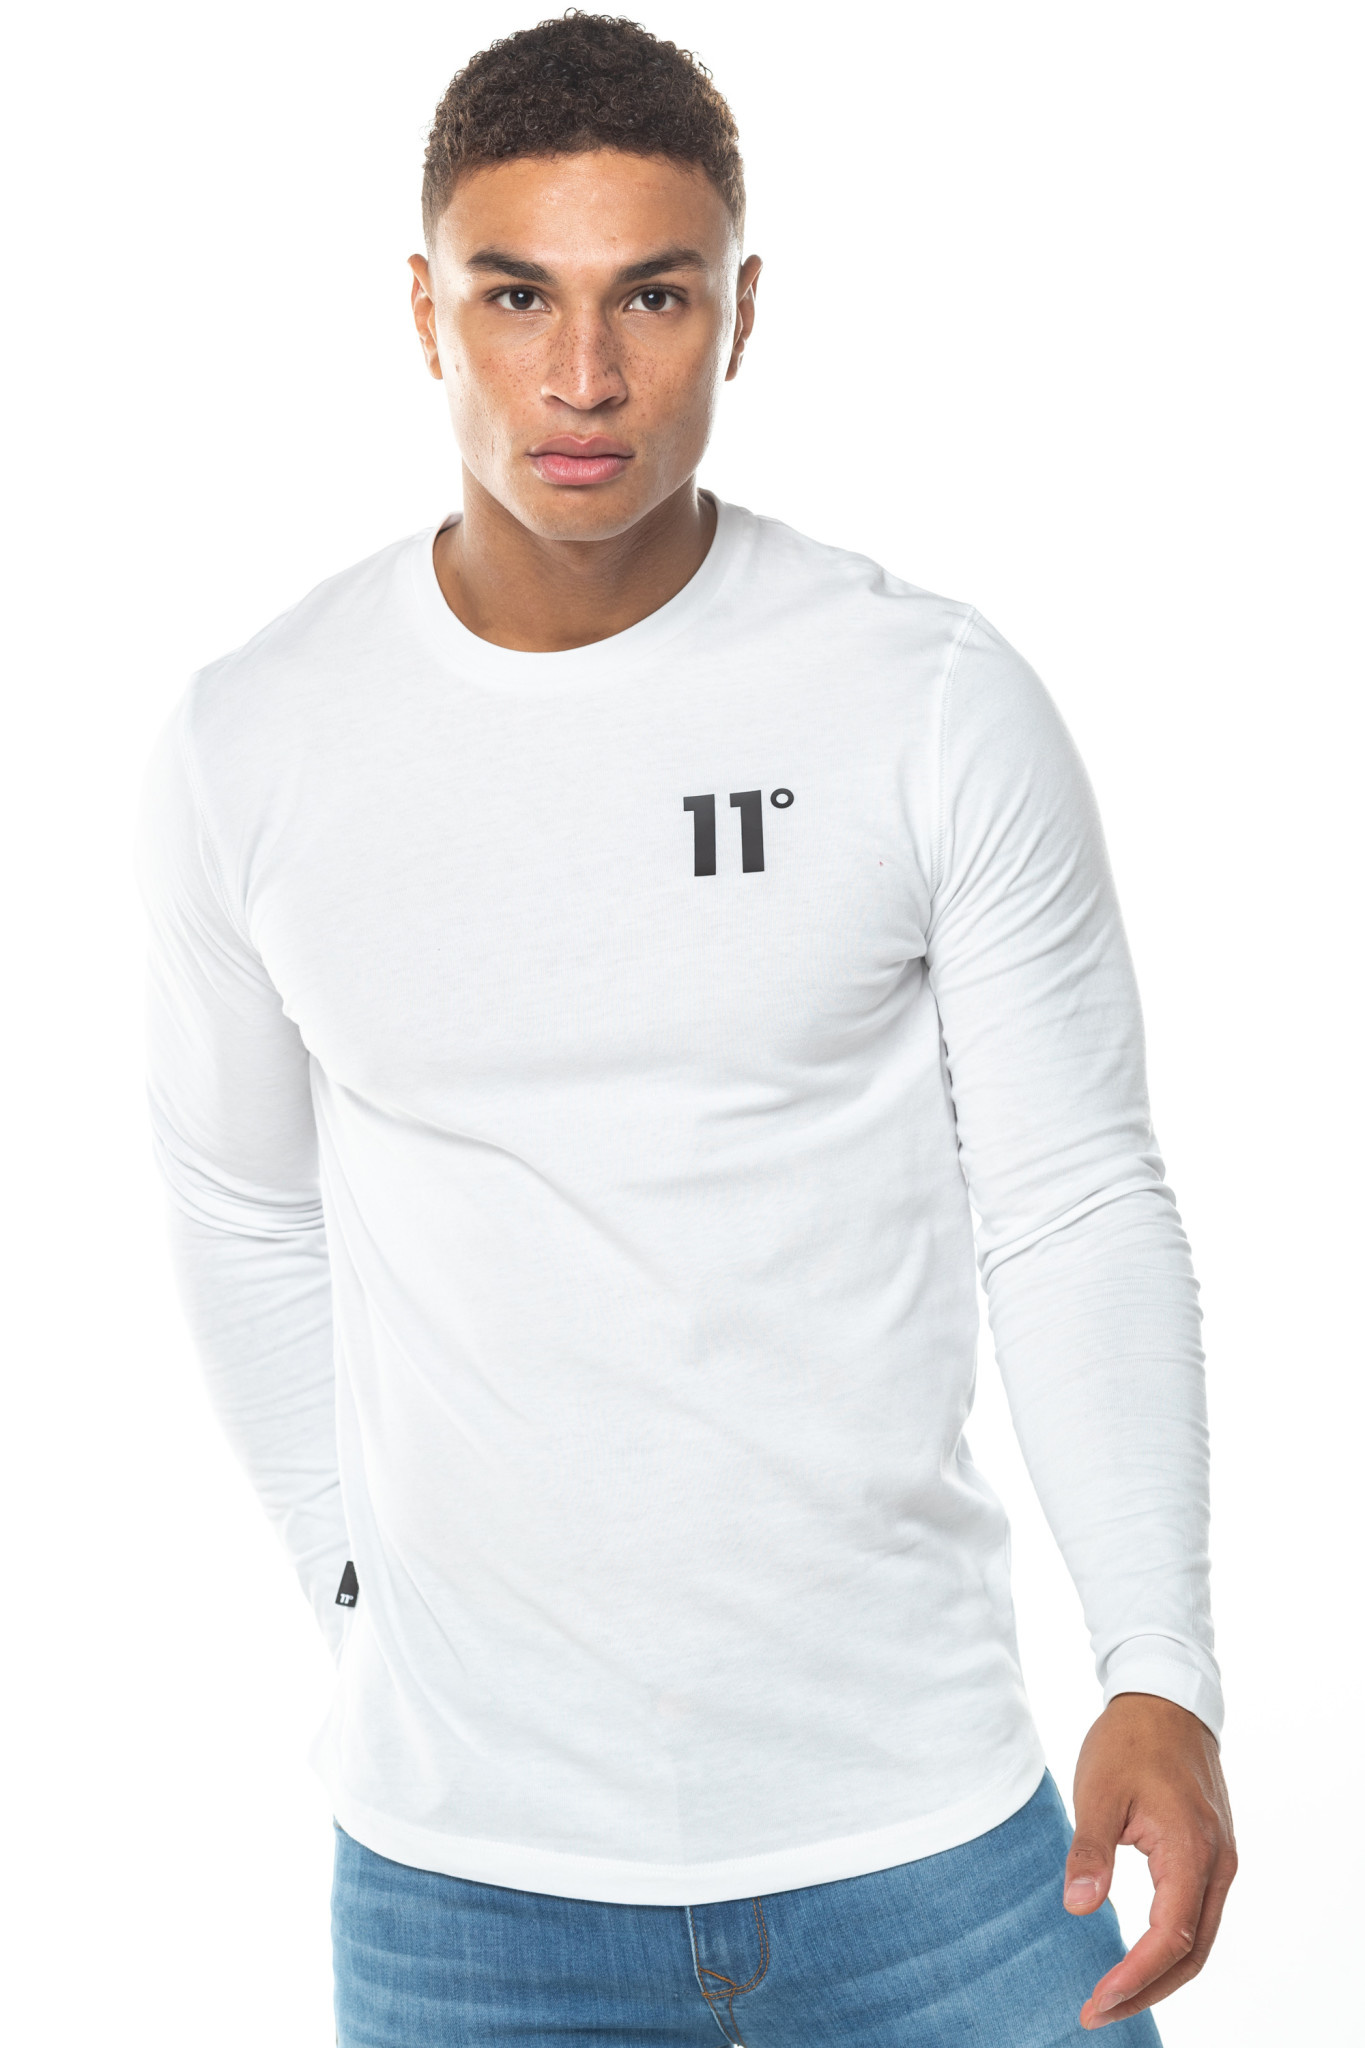 11 Degrees 11 Degrees Core Long Sleeve Tee White